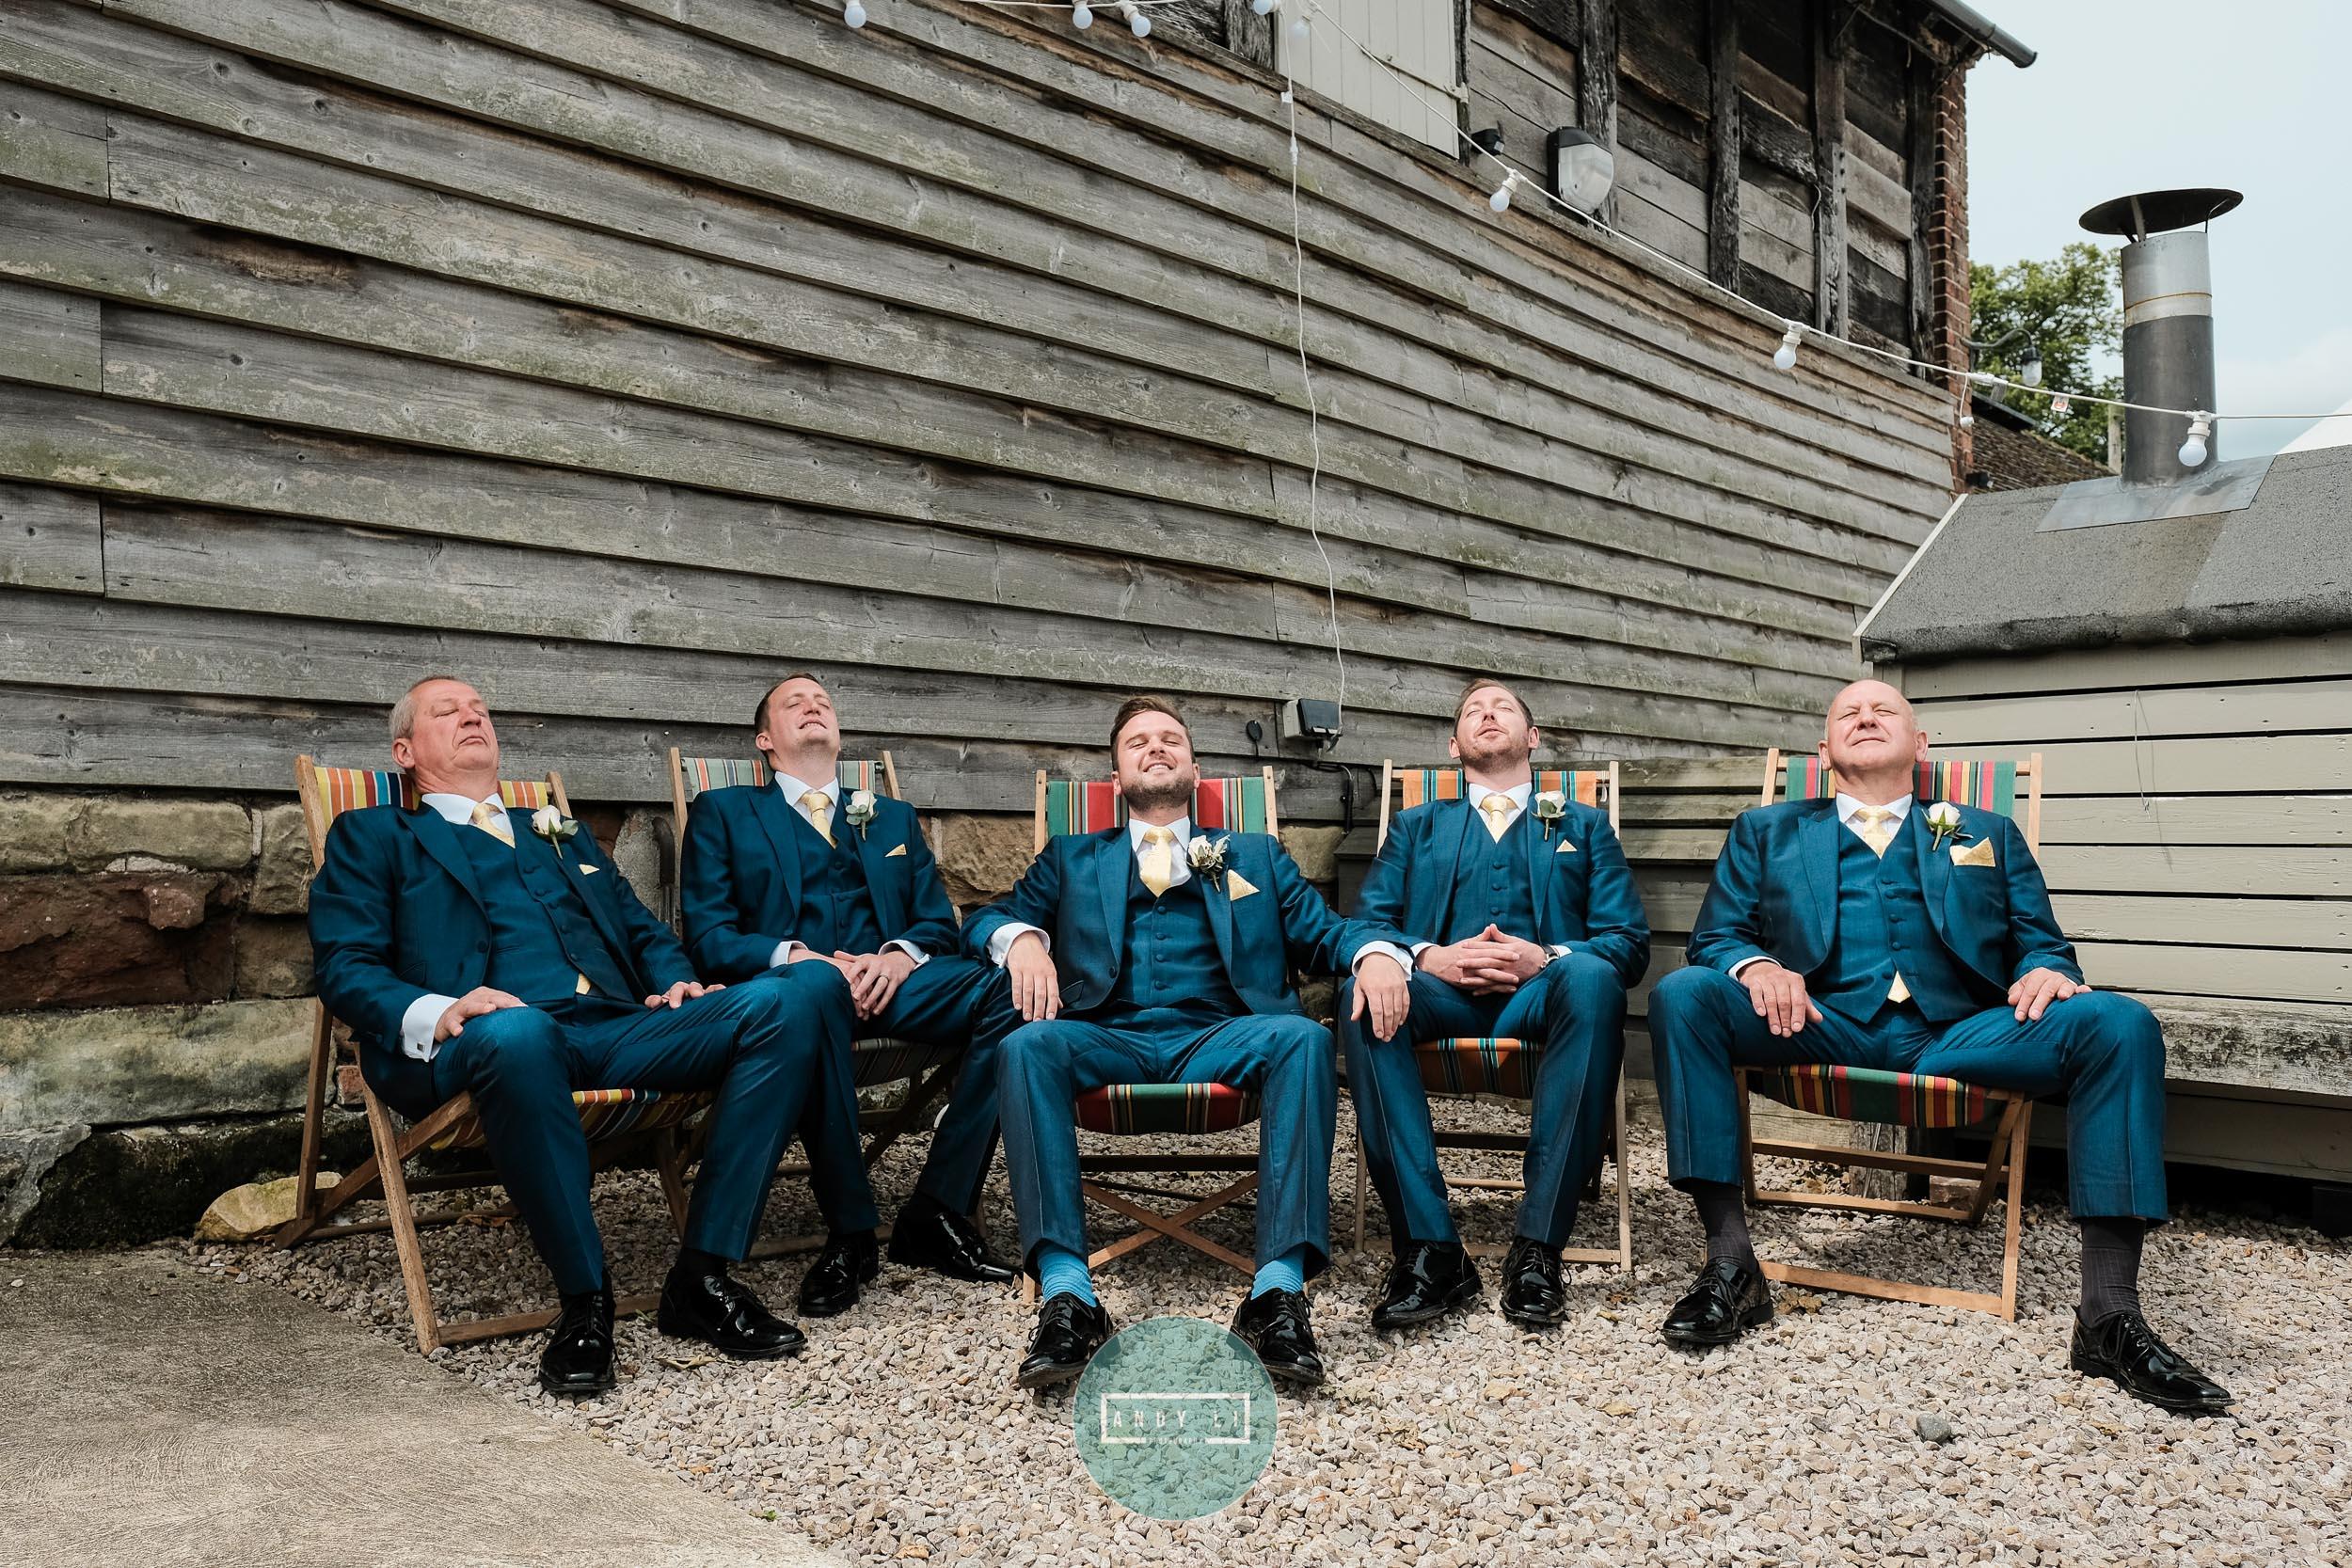 Pimhill Barn Wedding Photographer-019-XPRO5873.jpg